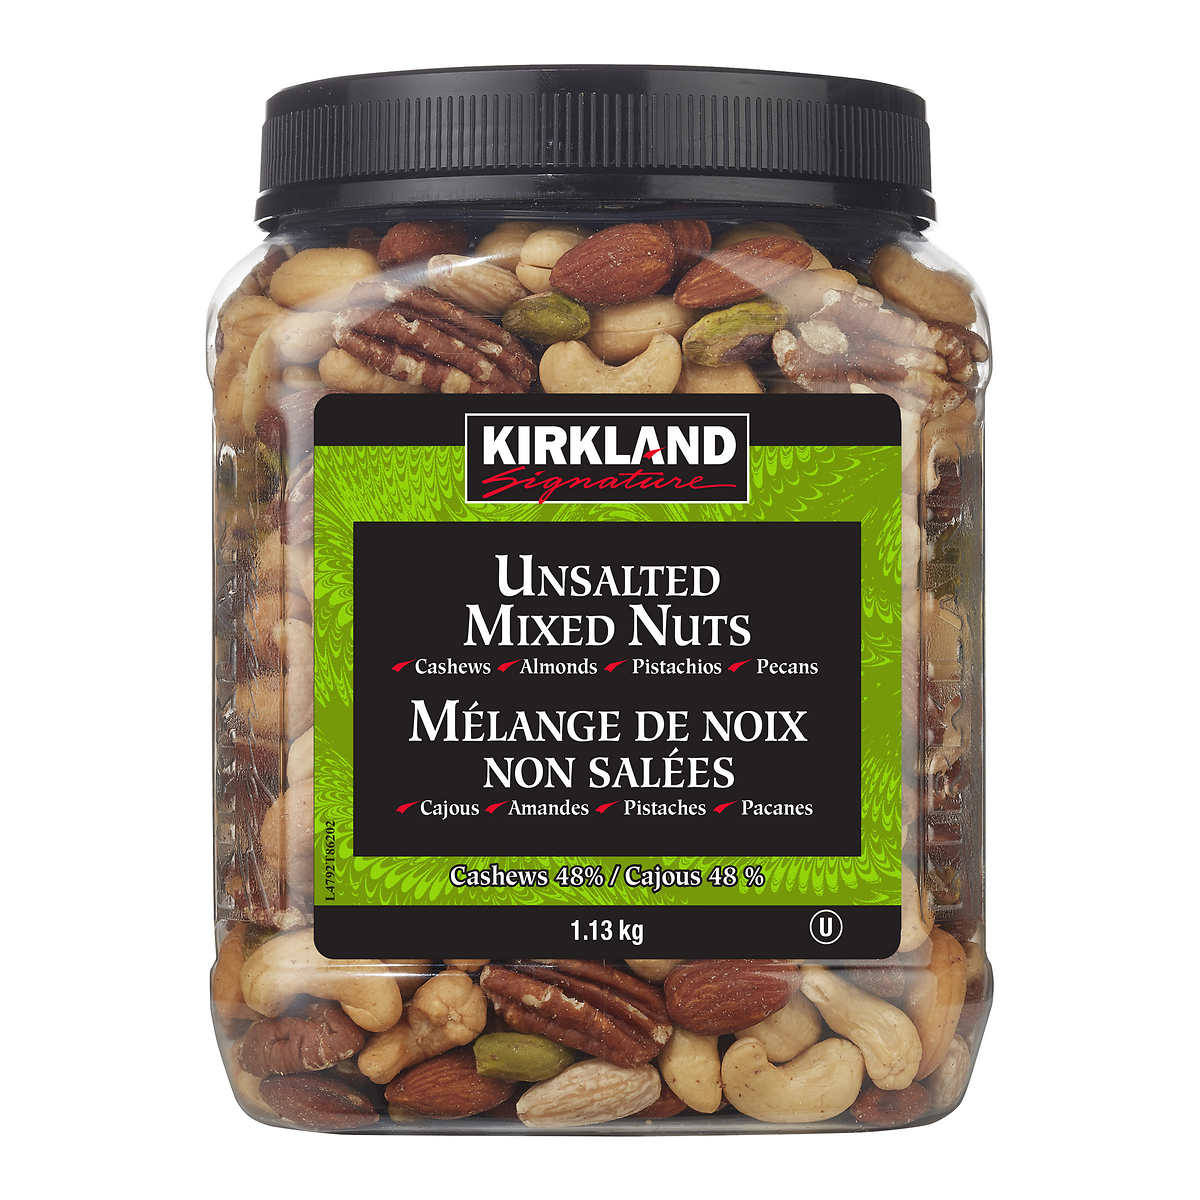 Kirkland Signature Unsalted Mixed Nuts, 1 13 kg (2 49 lb)